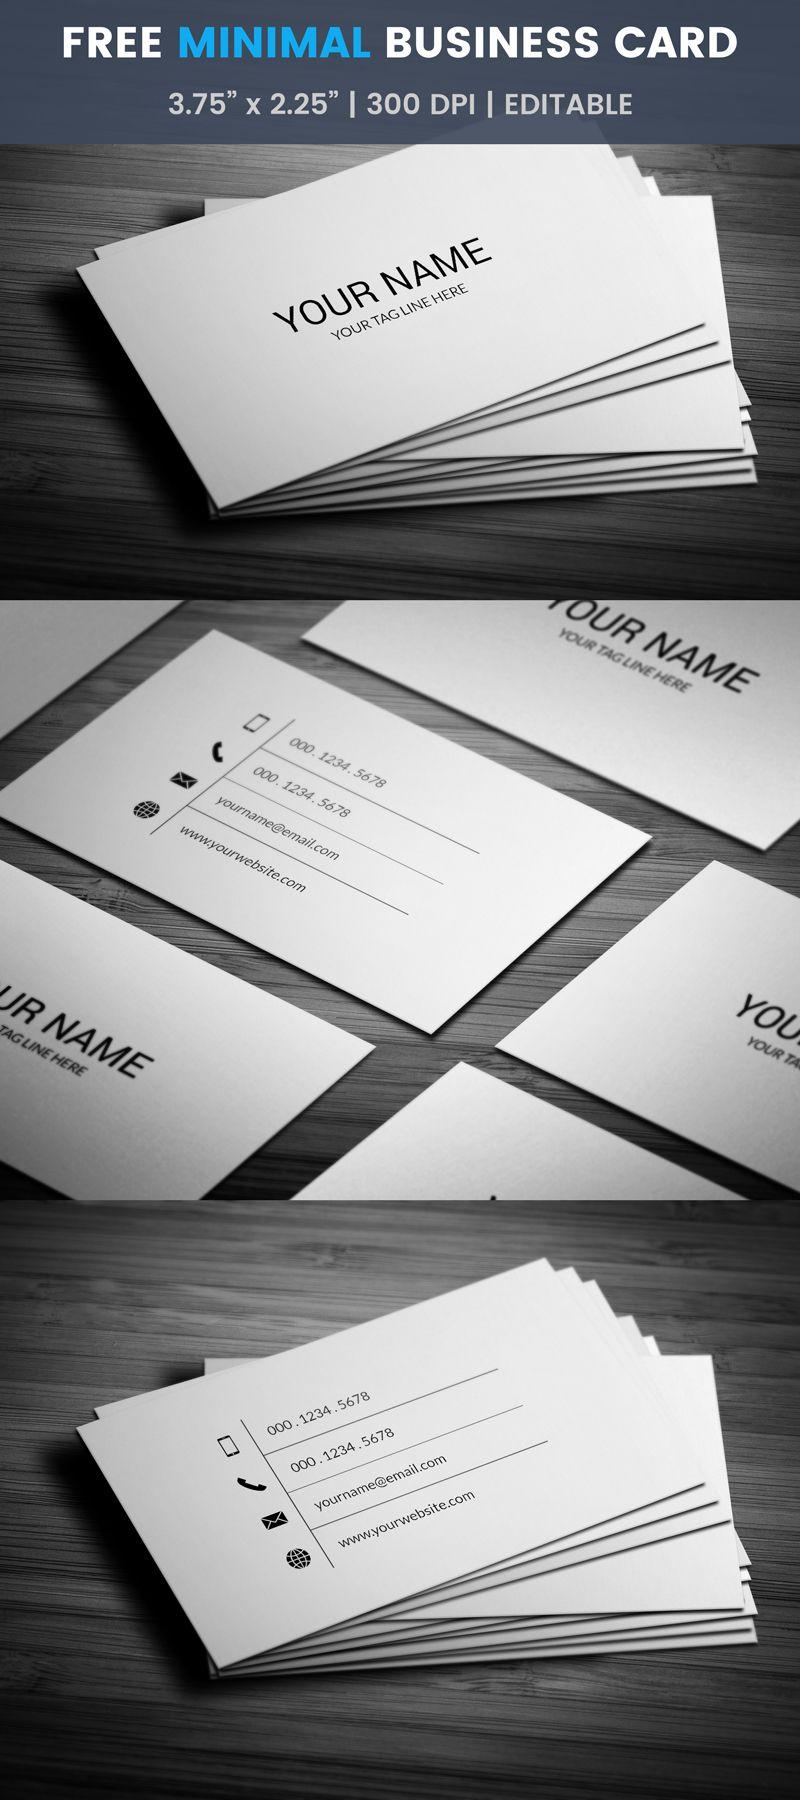 Minimal multipurpose business card template free card minimal multipurpose business card template free card businesscards colourmoves